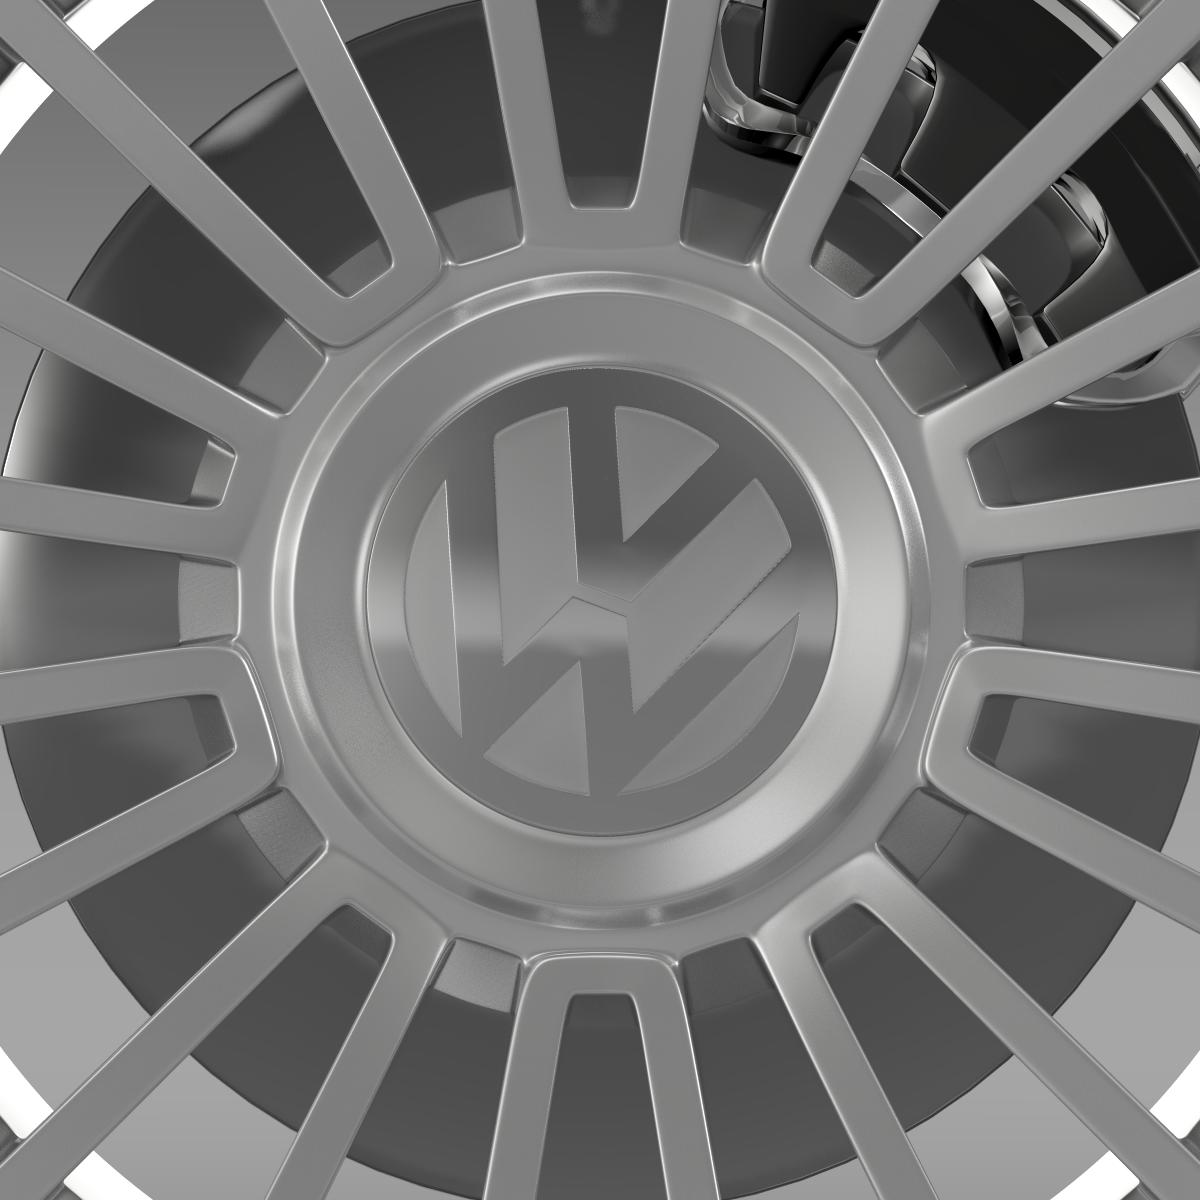 volkswagen up wheel 3d model 3ds max fbx c4d lwo ma mb hrc xsi obj 210887